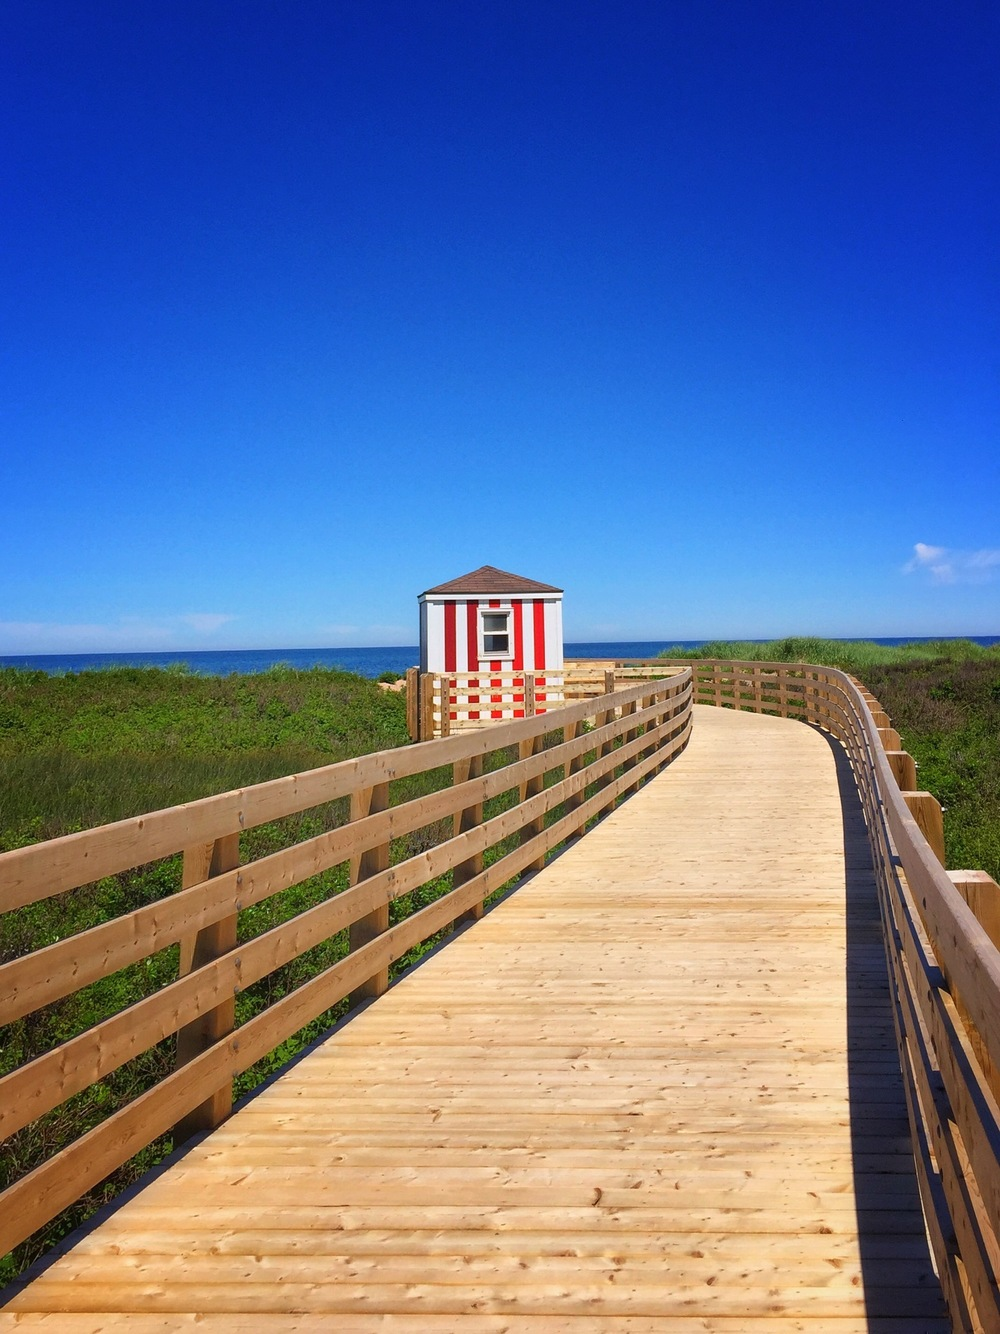 Boardwalk at Prince Edward Island National Park